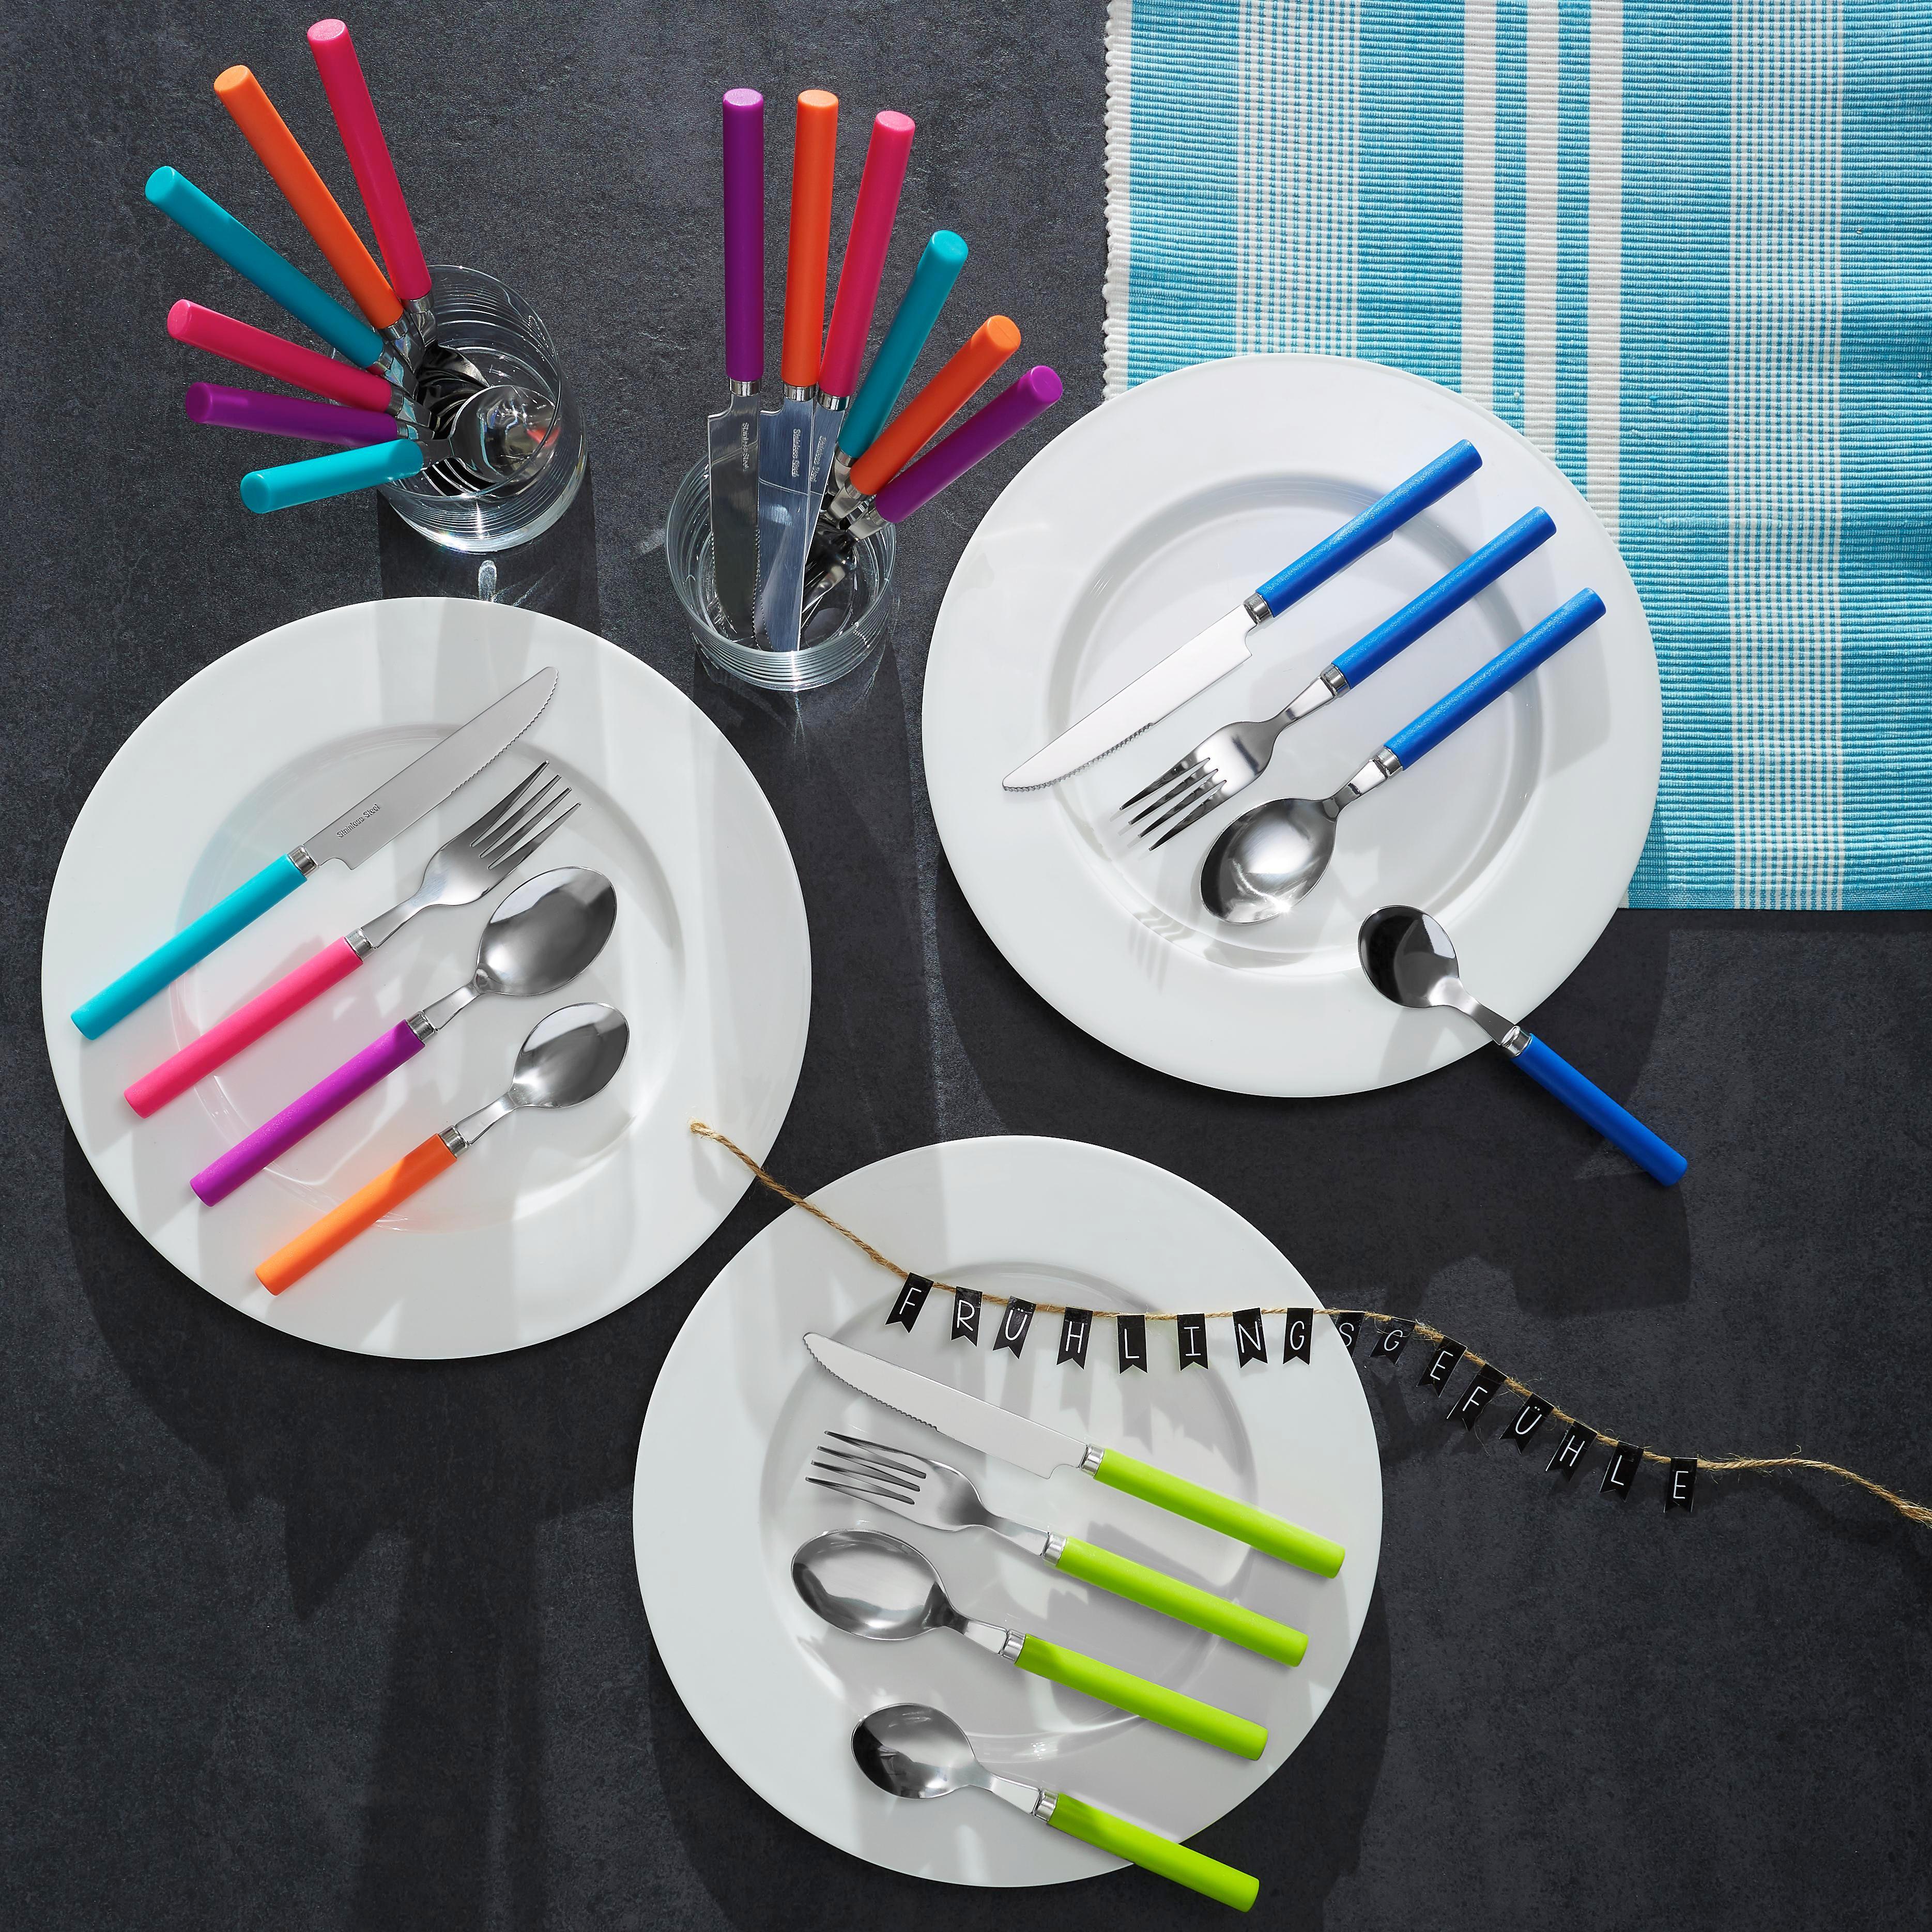 LÖFFELSET - Silberfarben/Lila, Basics, Kunststoff/Metall (29/22/2cm)